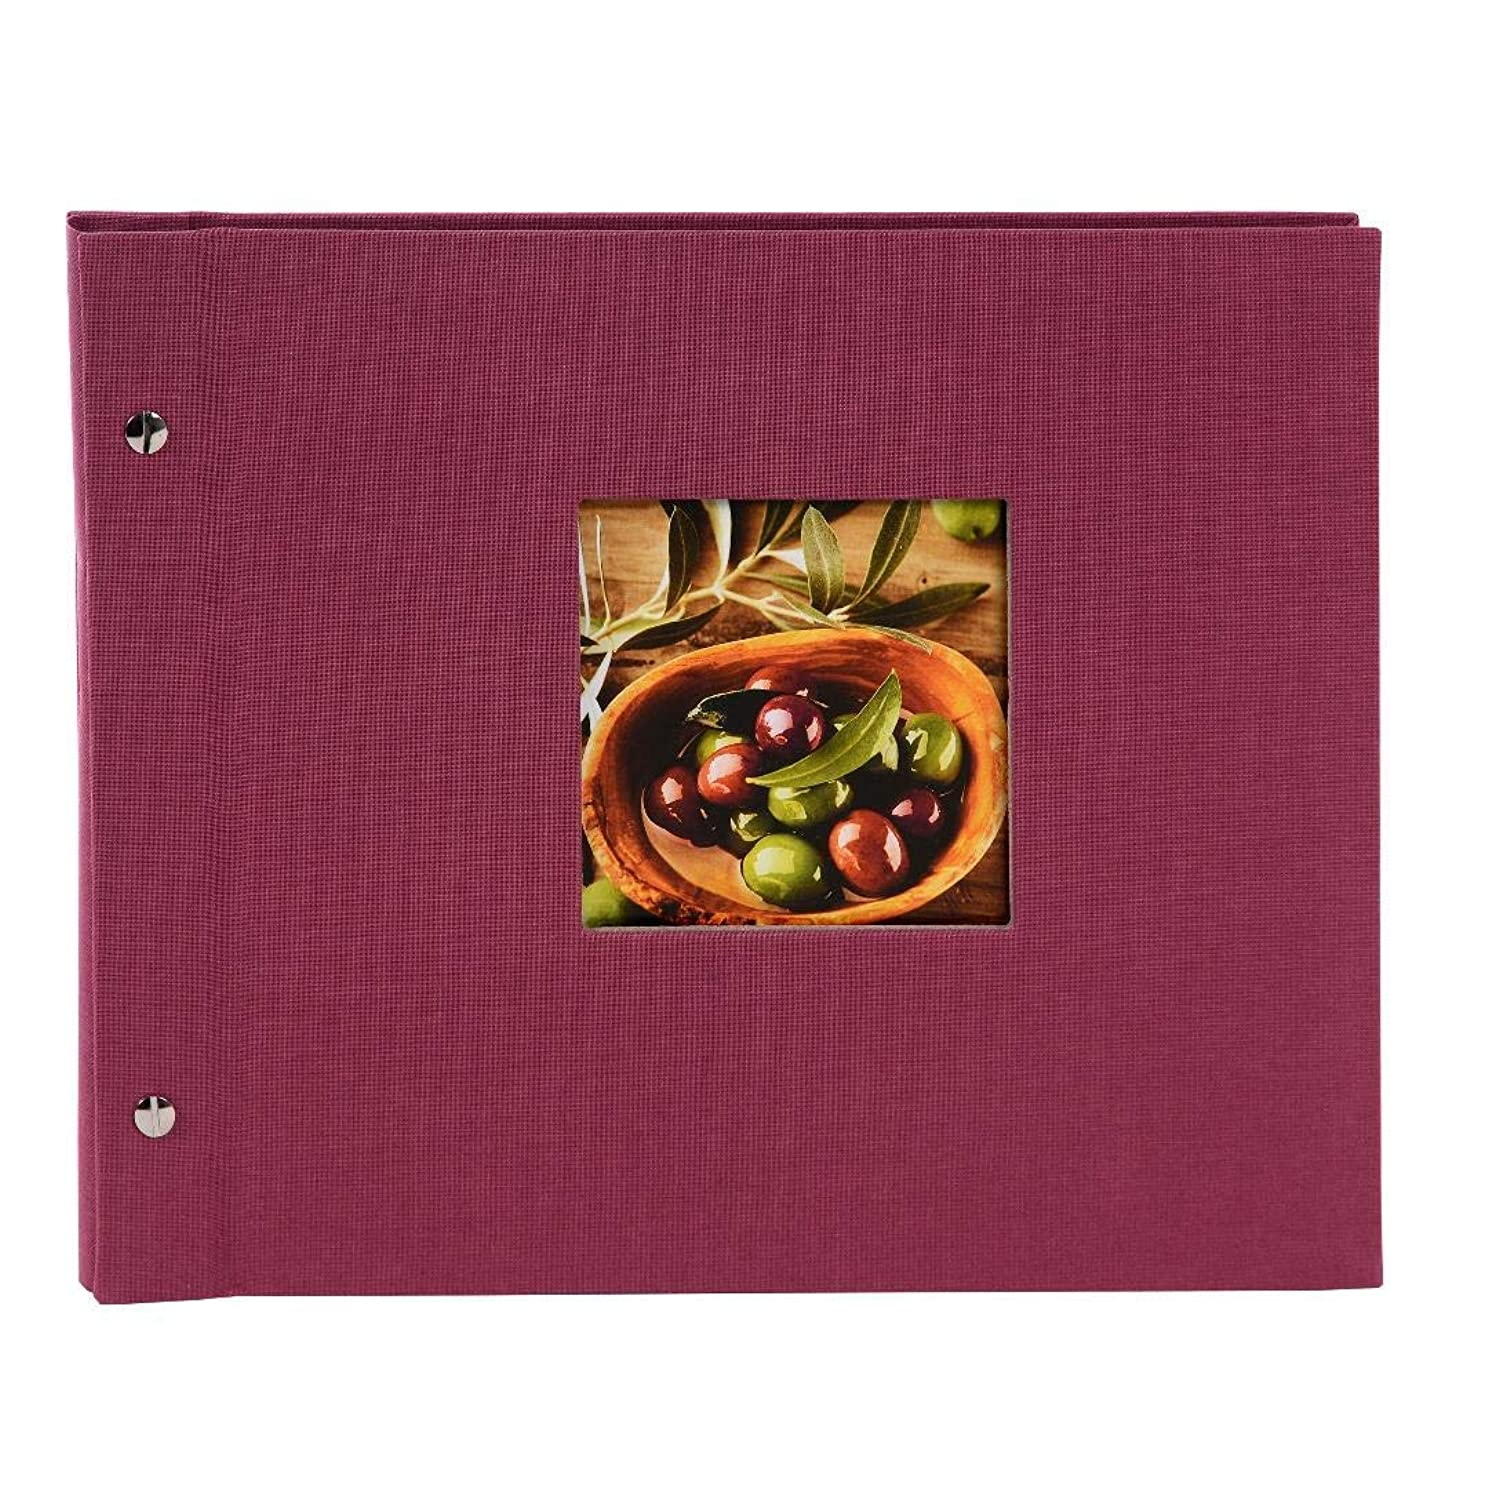 Goldbuch Spiral Album Bella Vista, 35?x 30?cm 40?Black Sheets Fuchsia?–?25508